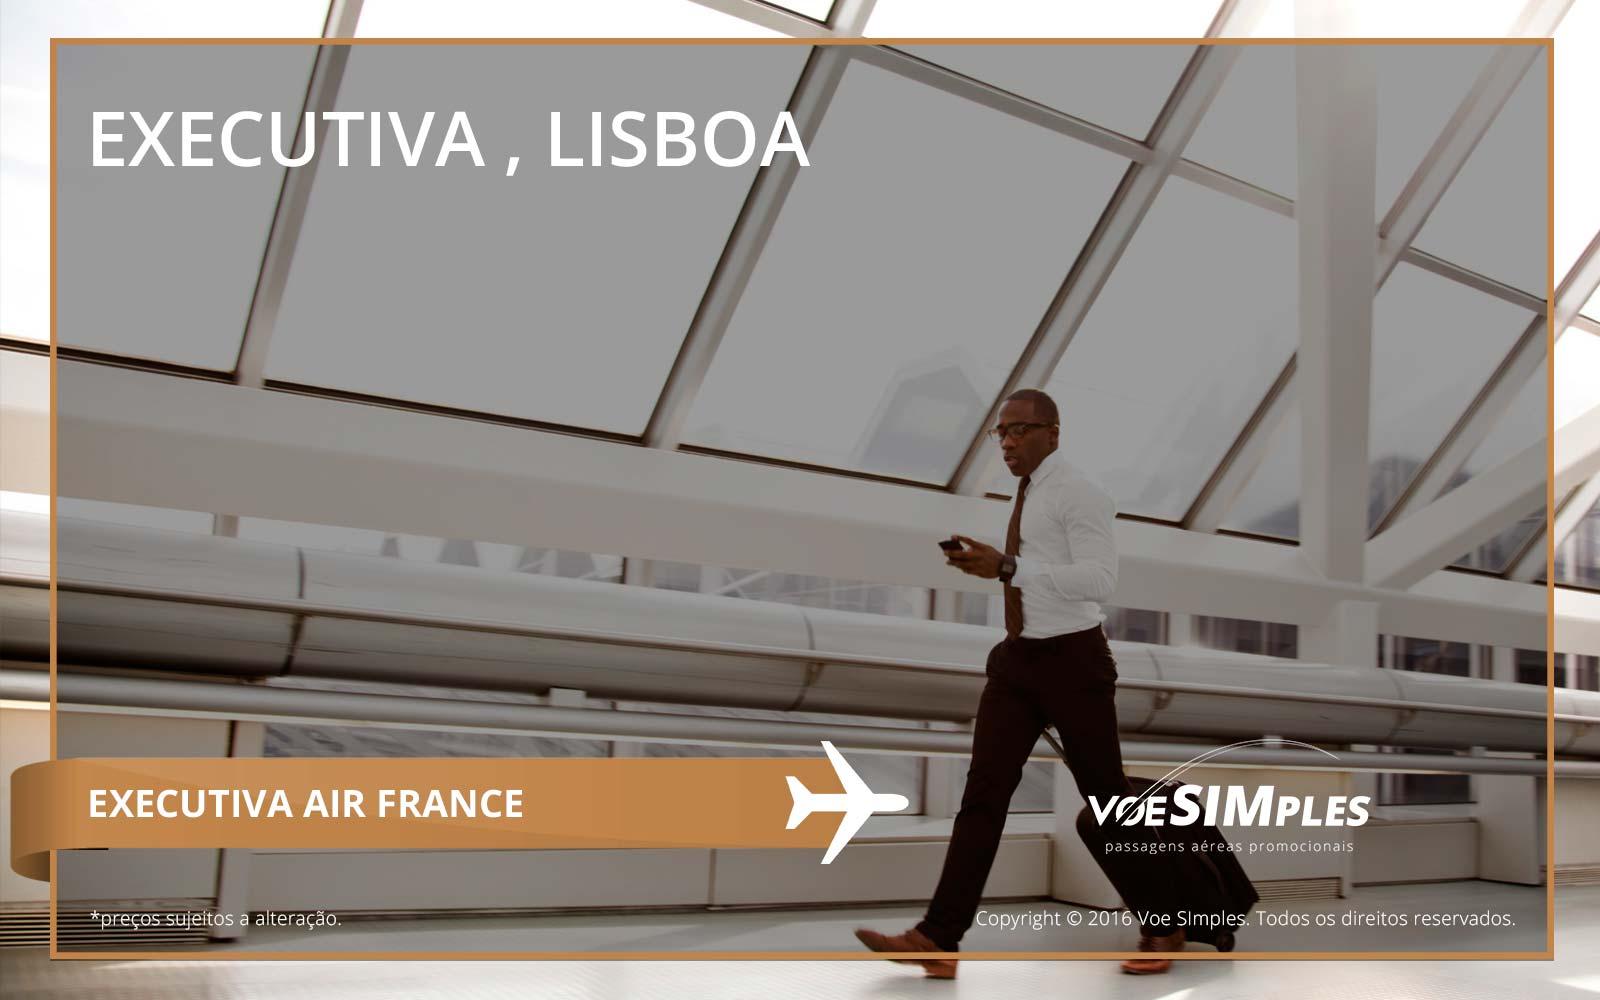 Passagem aérea Classe Executiva Air France para Lisboa